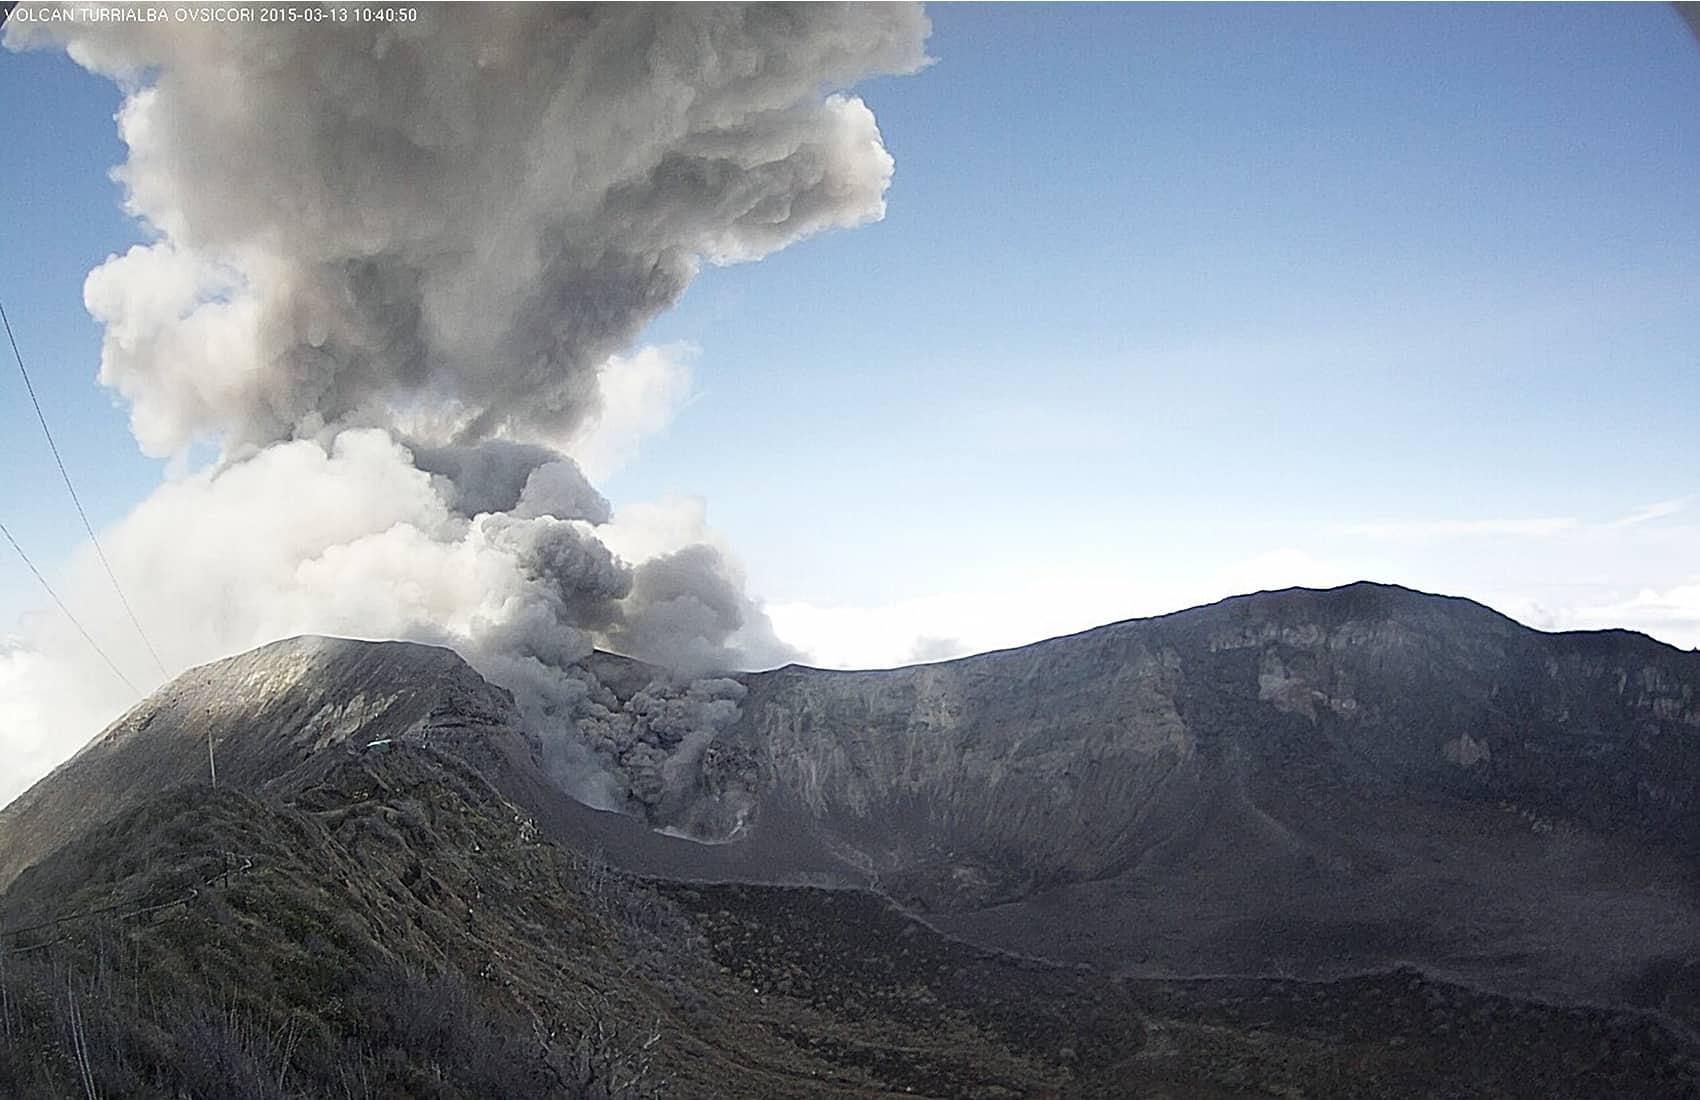 Turrialba Volcano, March 13, 2015.